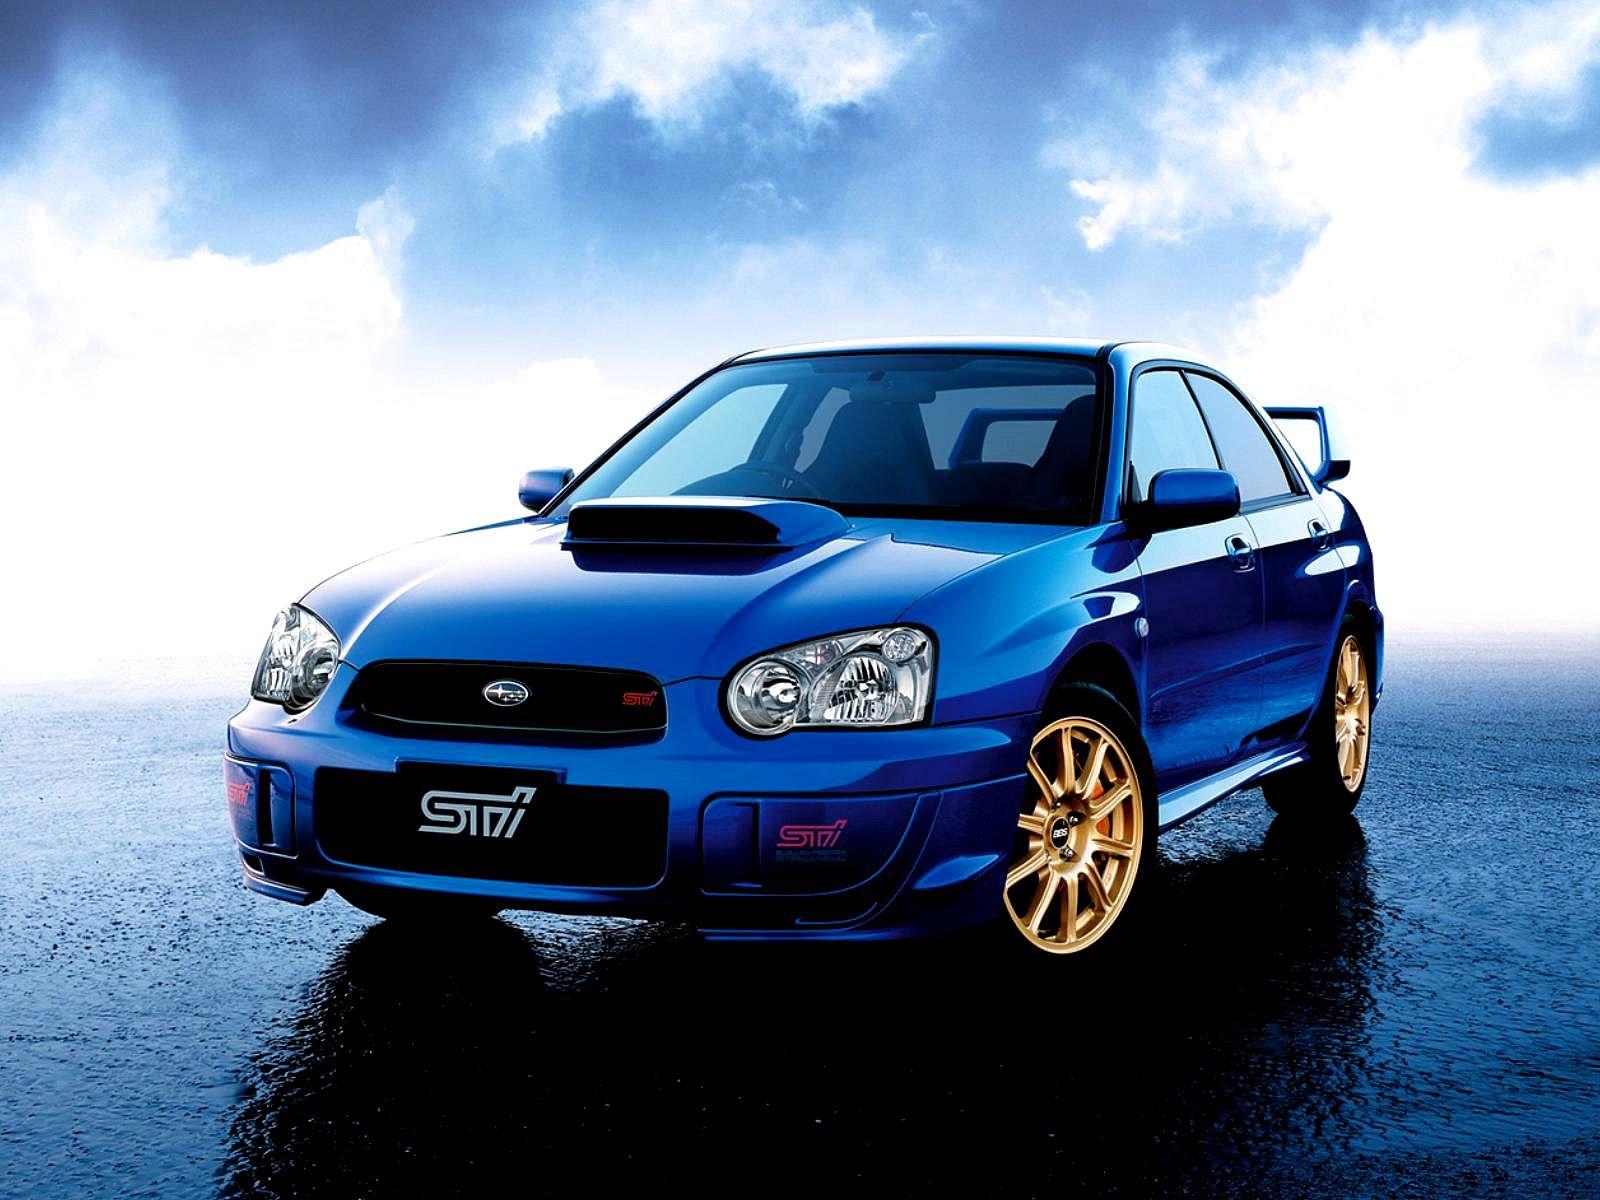 Subaru Impreza Wrx Sti Azul Subaru Impreza Wrx Sti Especial Japon